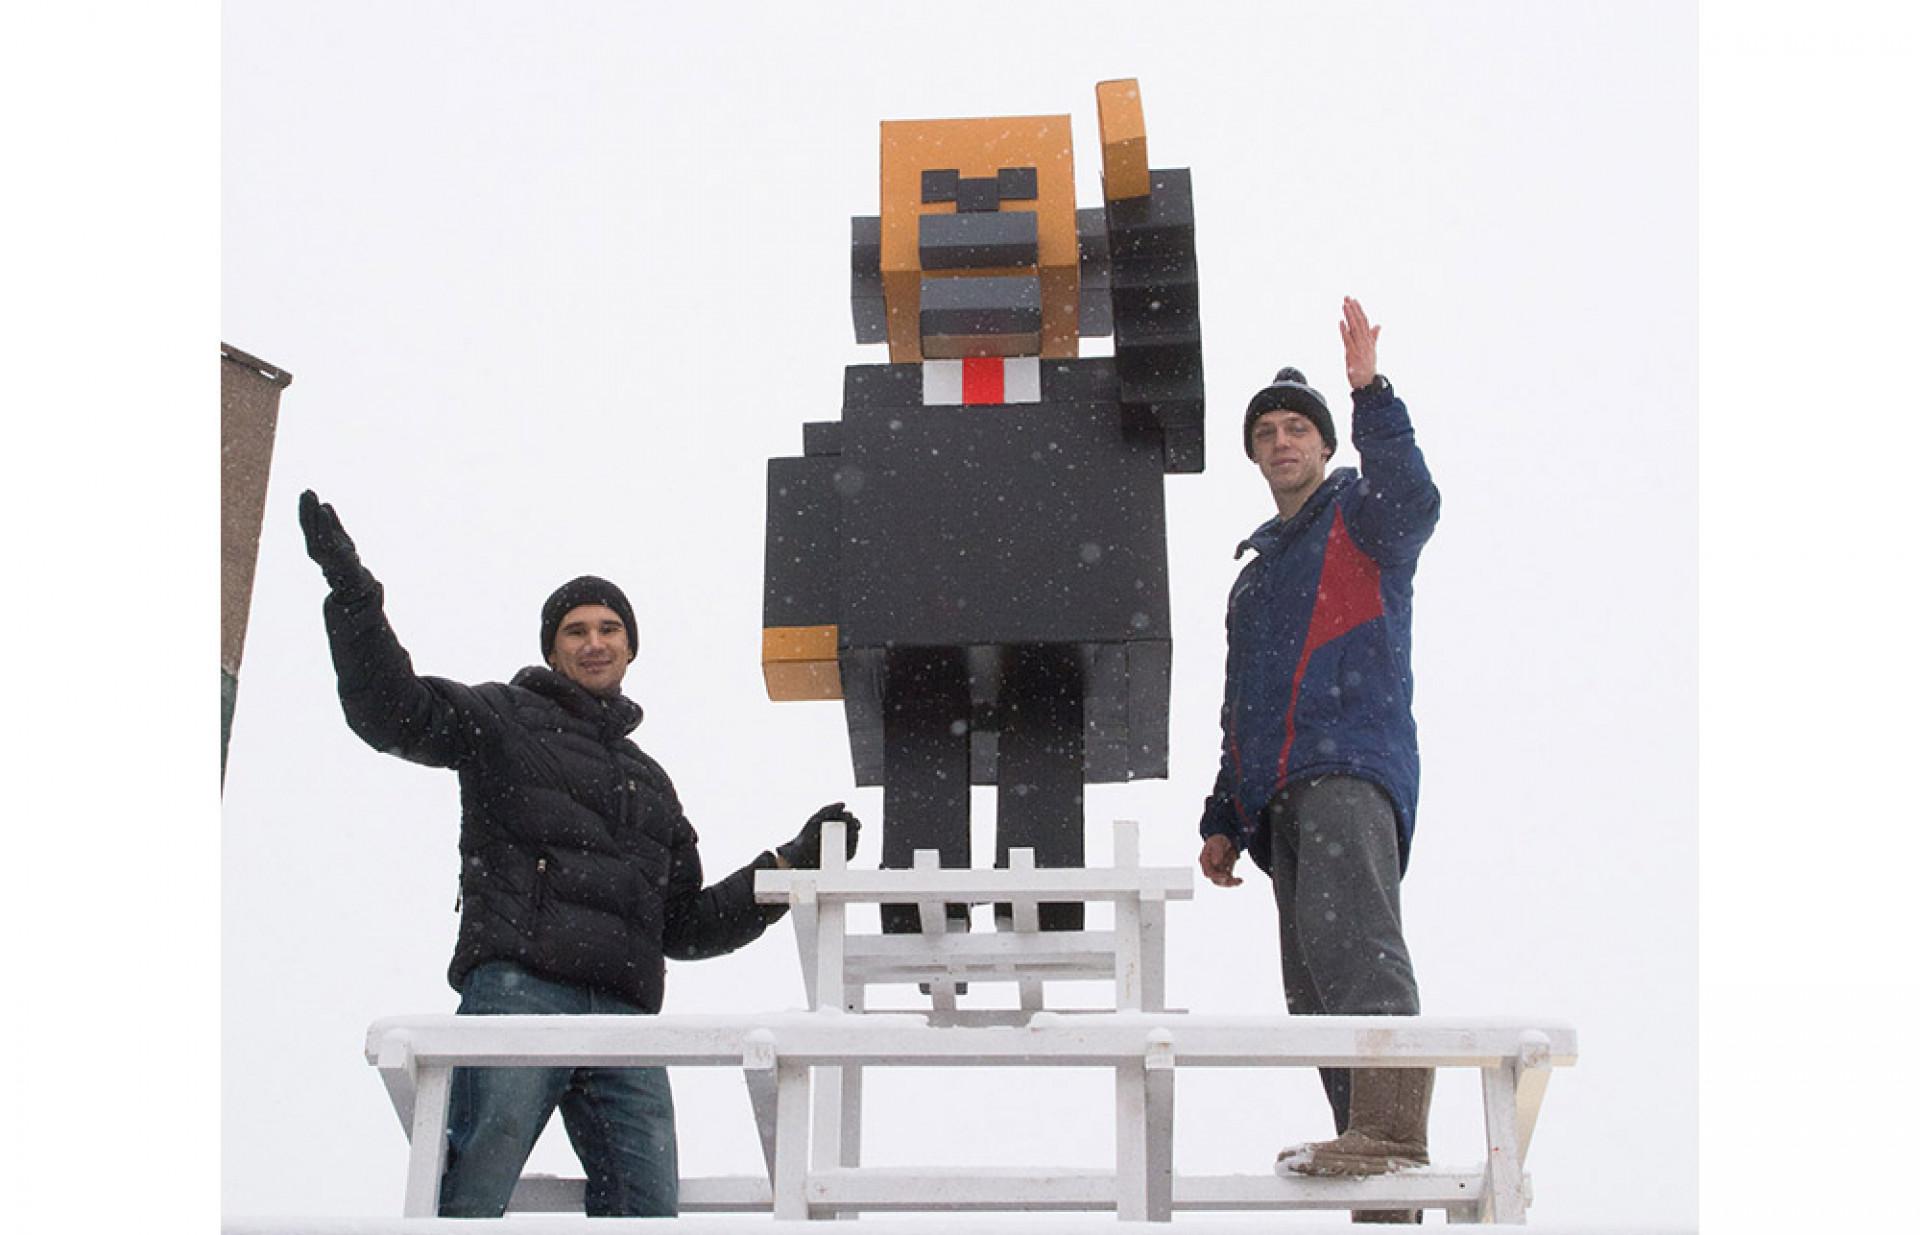 Minecraft Lenin Statue Riles Russia's Communists